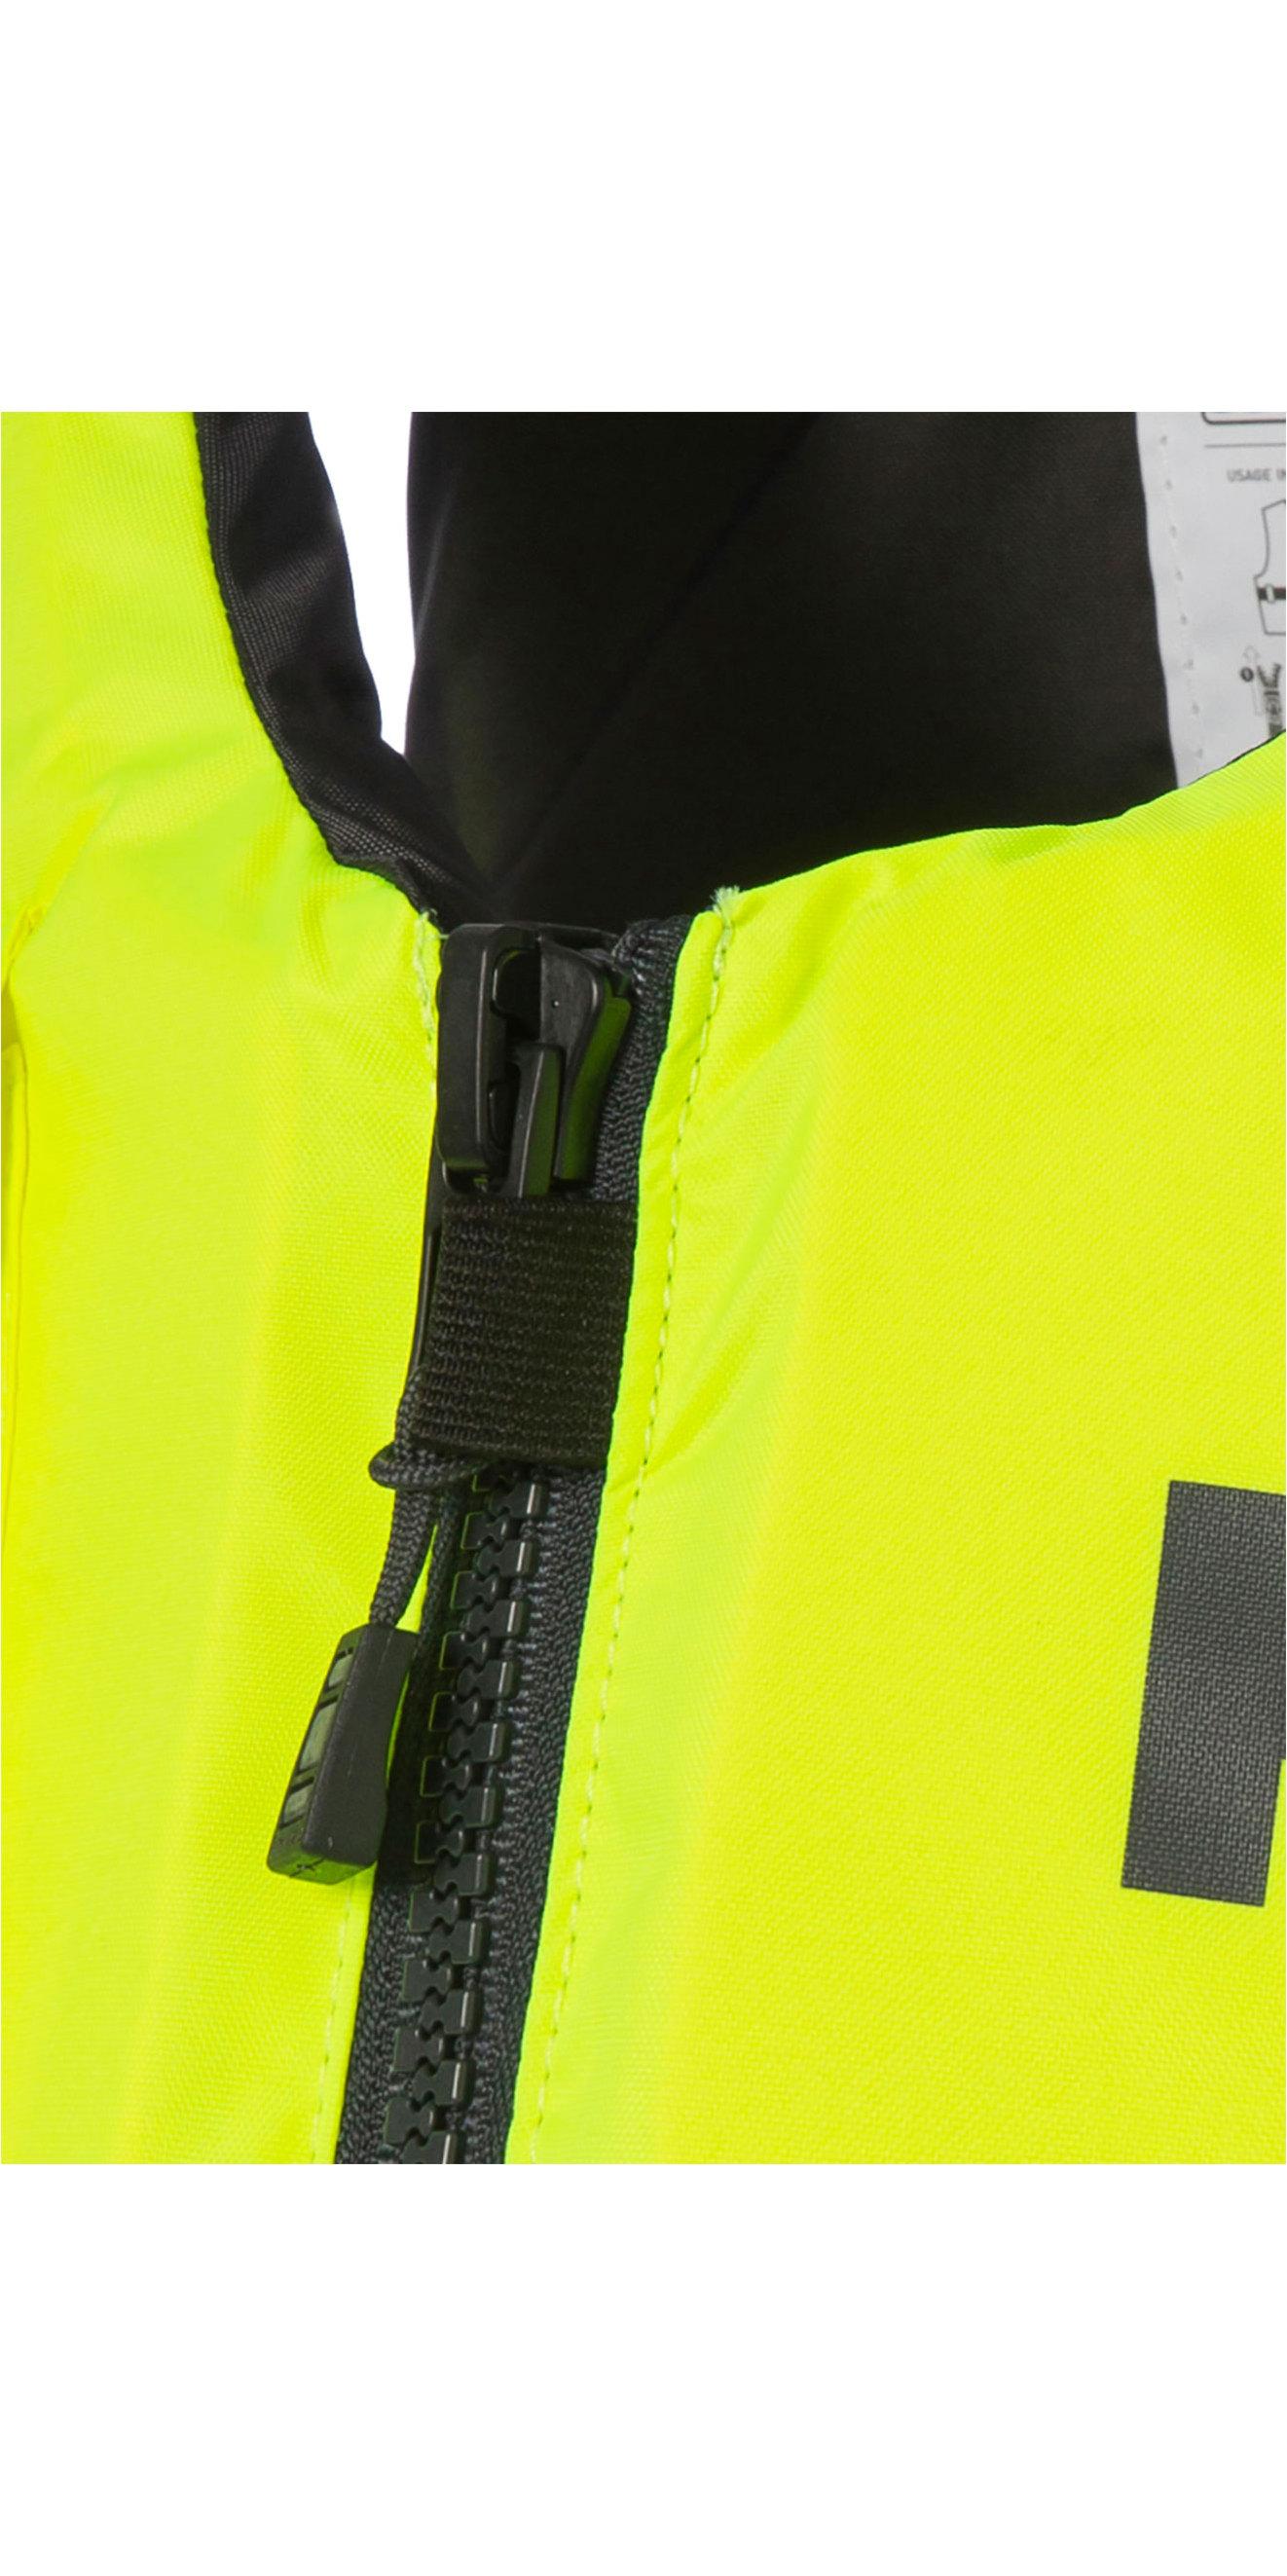 2020 Helly Hansen 50N Rider Vest / Buoyancy Aid 33820 - Fluro Yellow